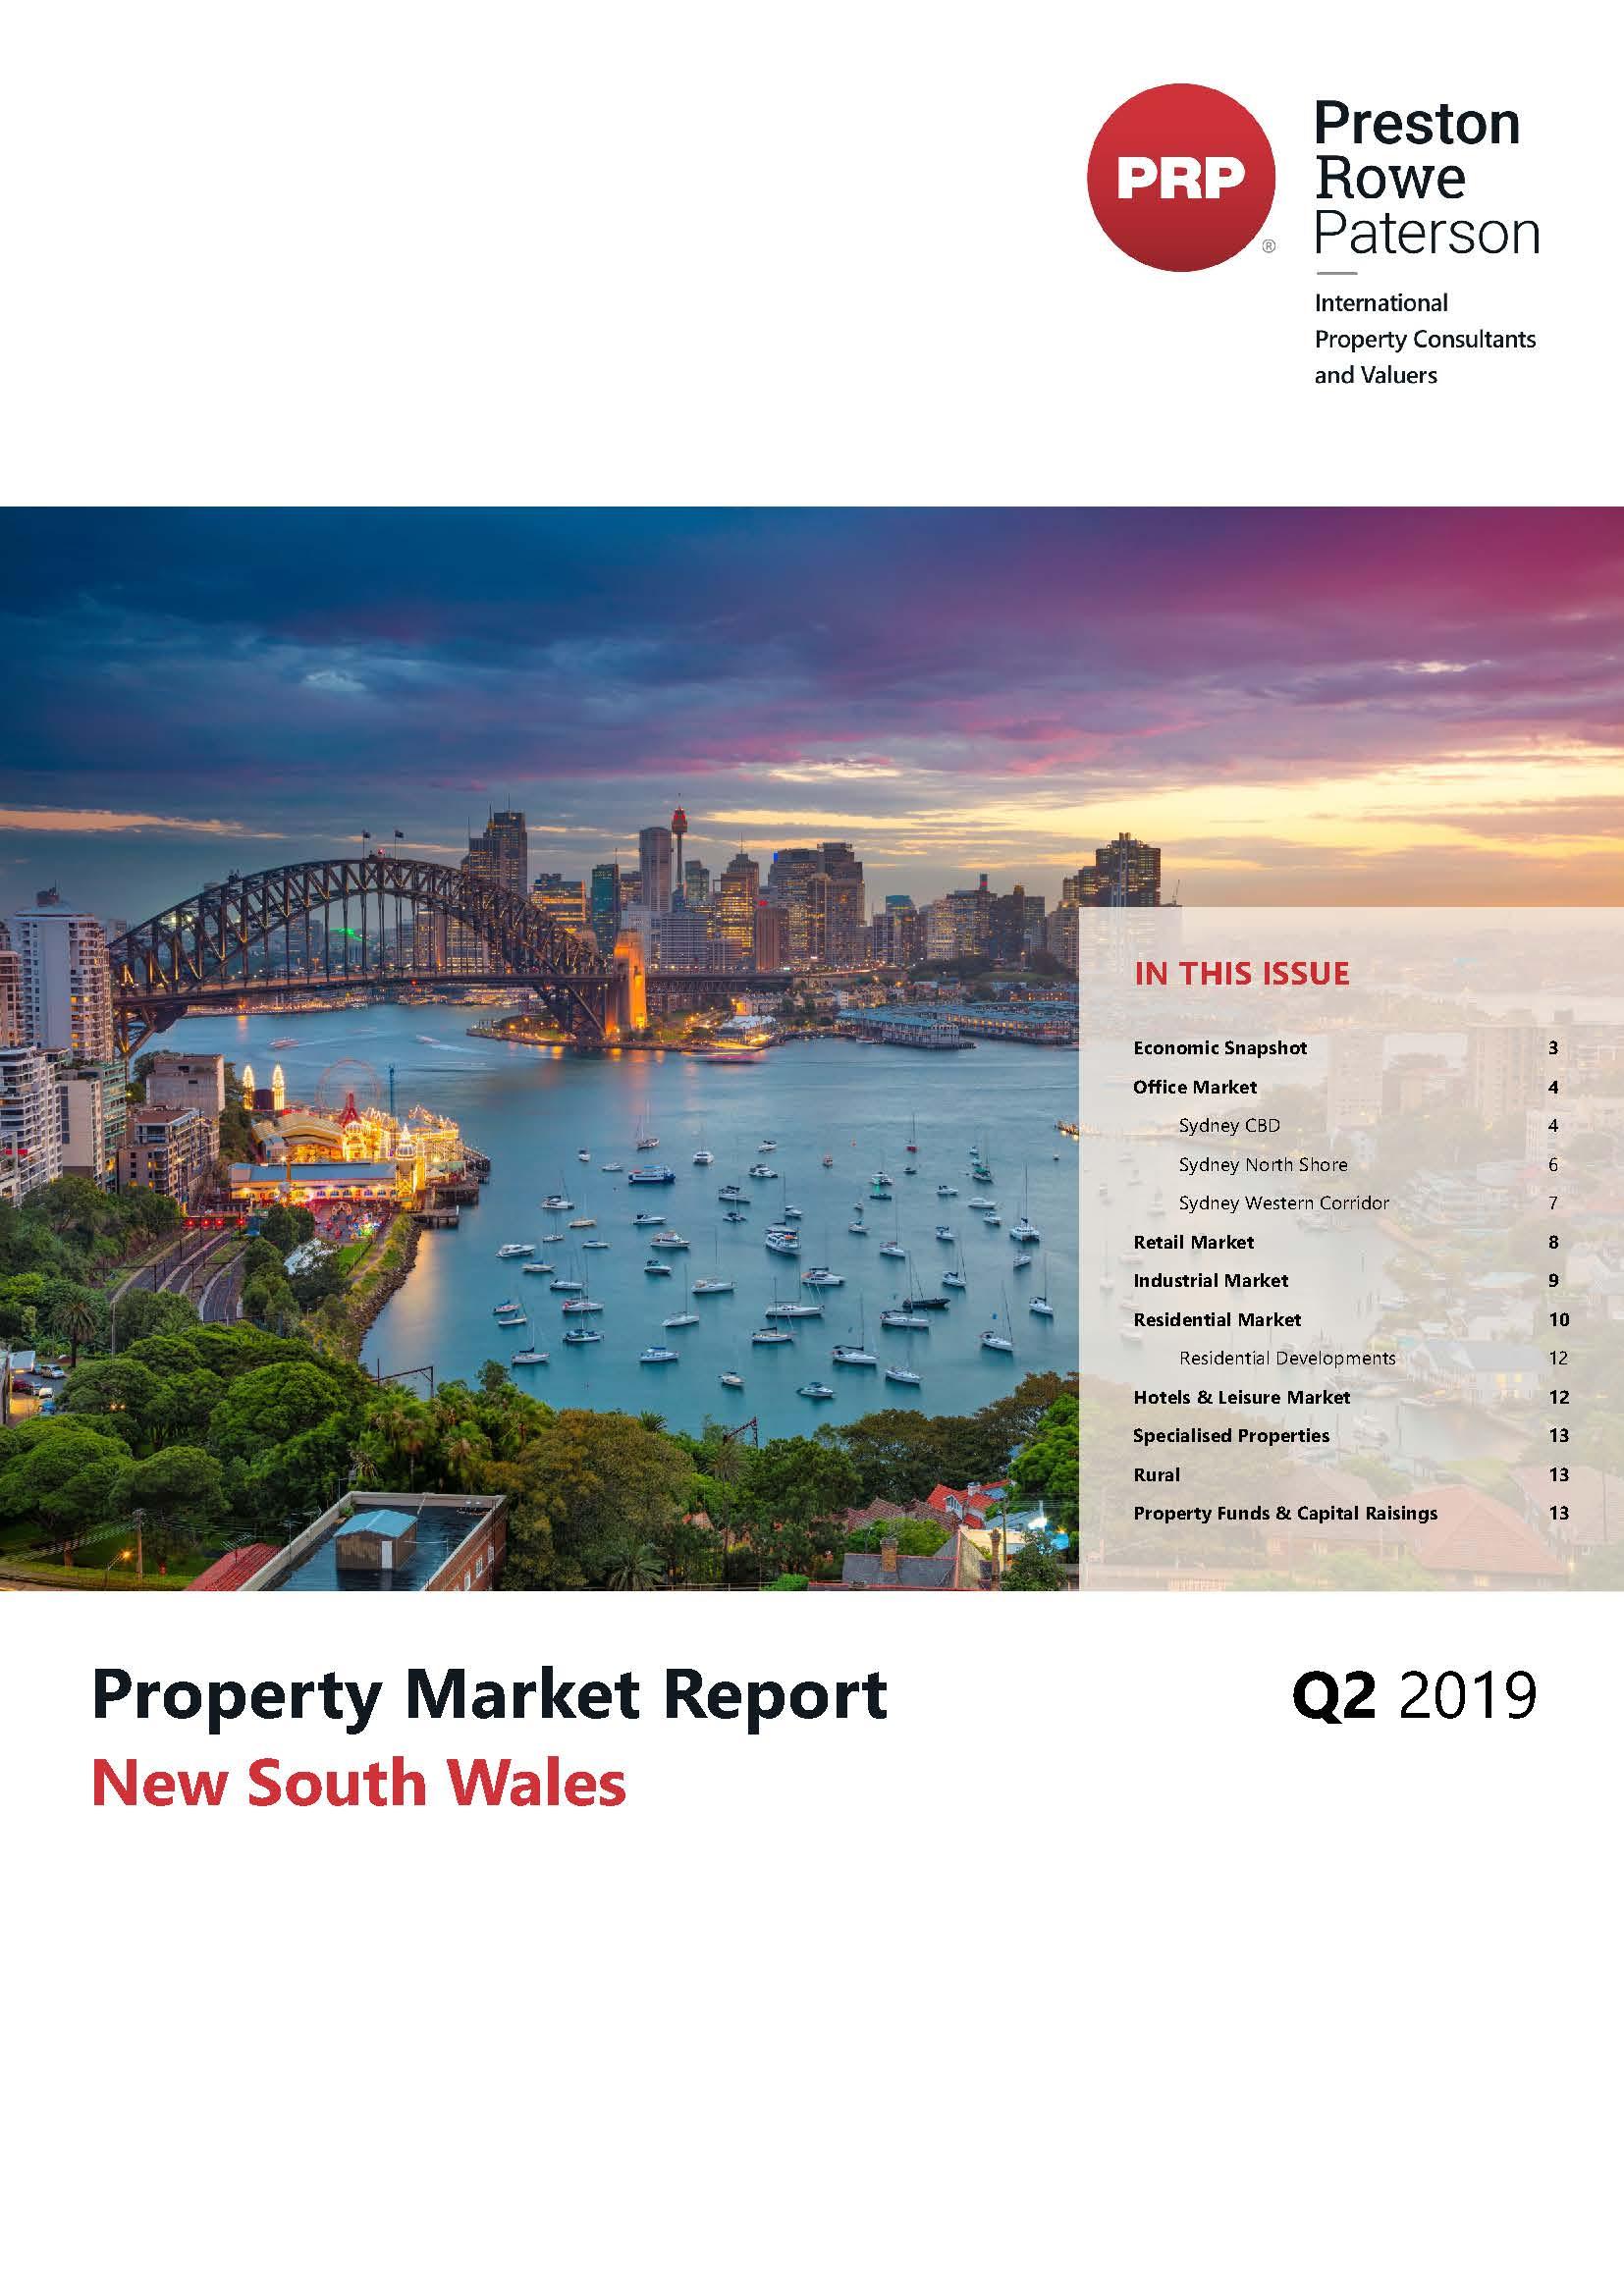 NSW Property Market Report Q2 2019